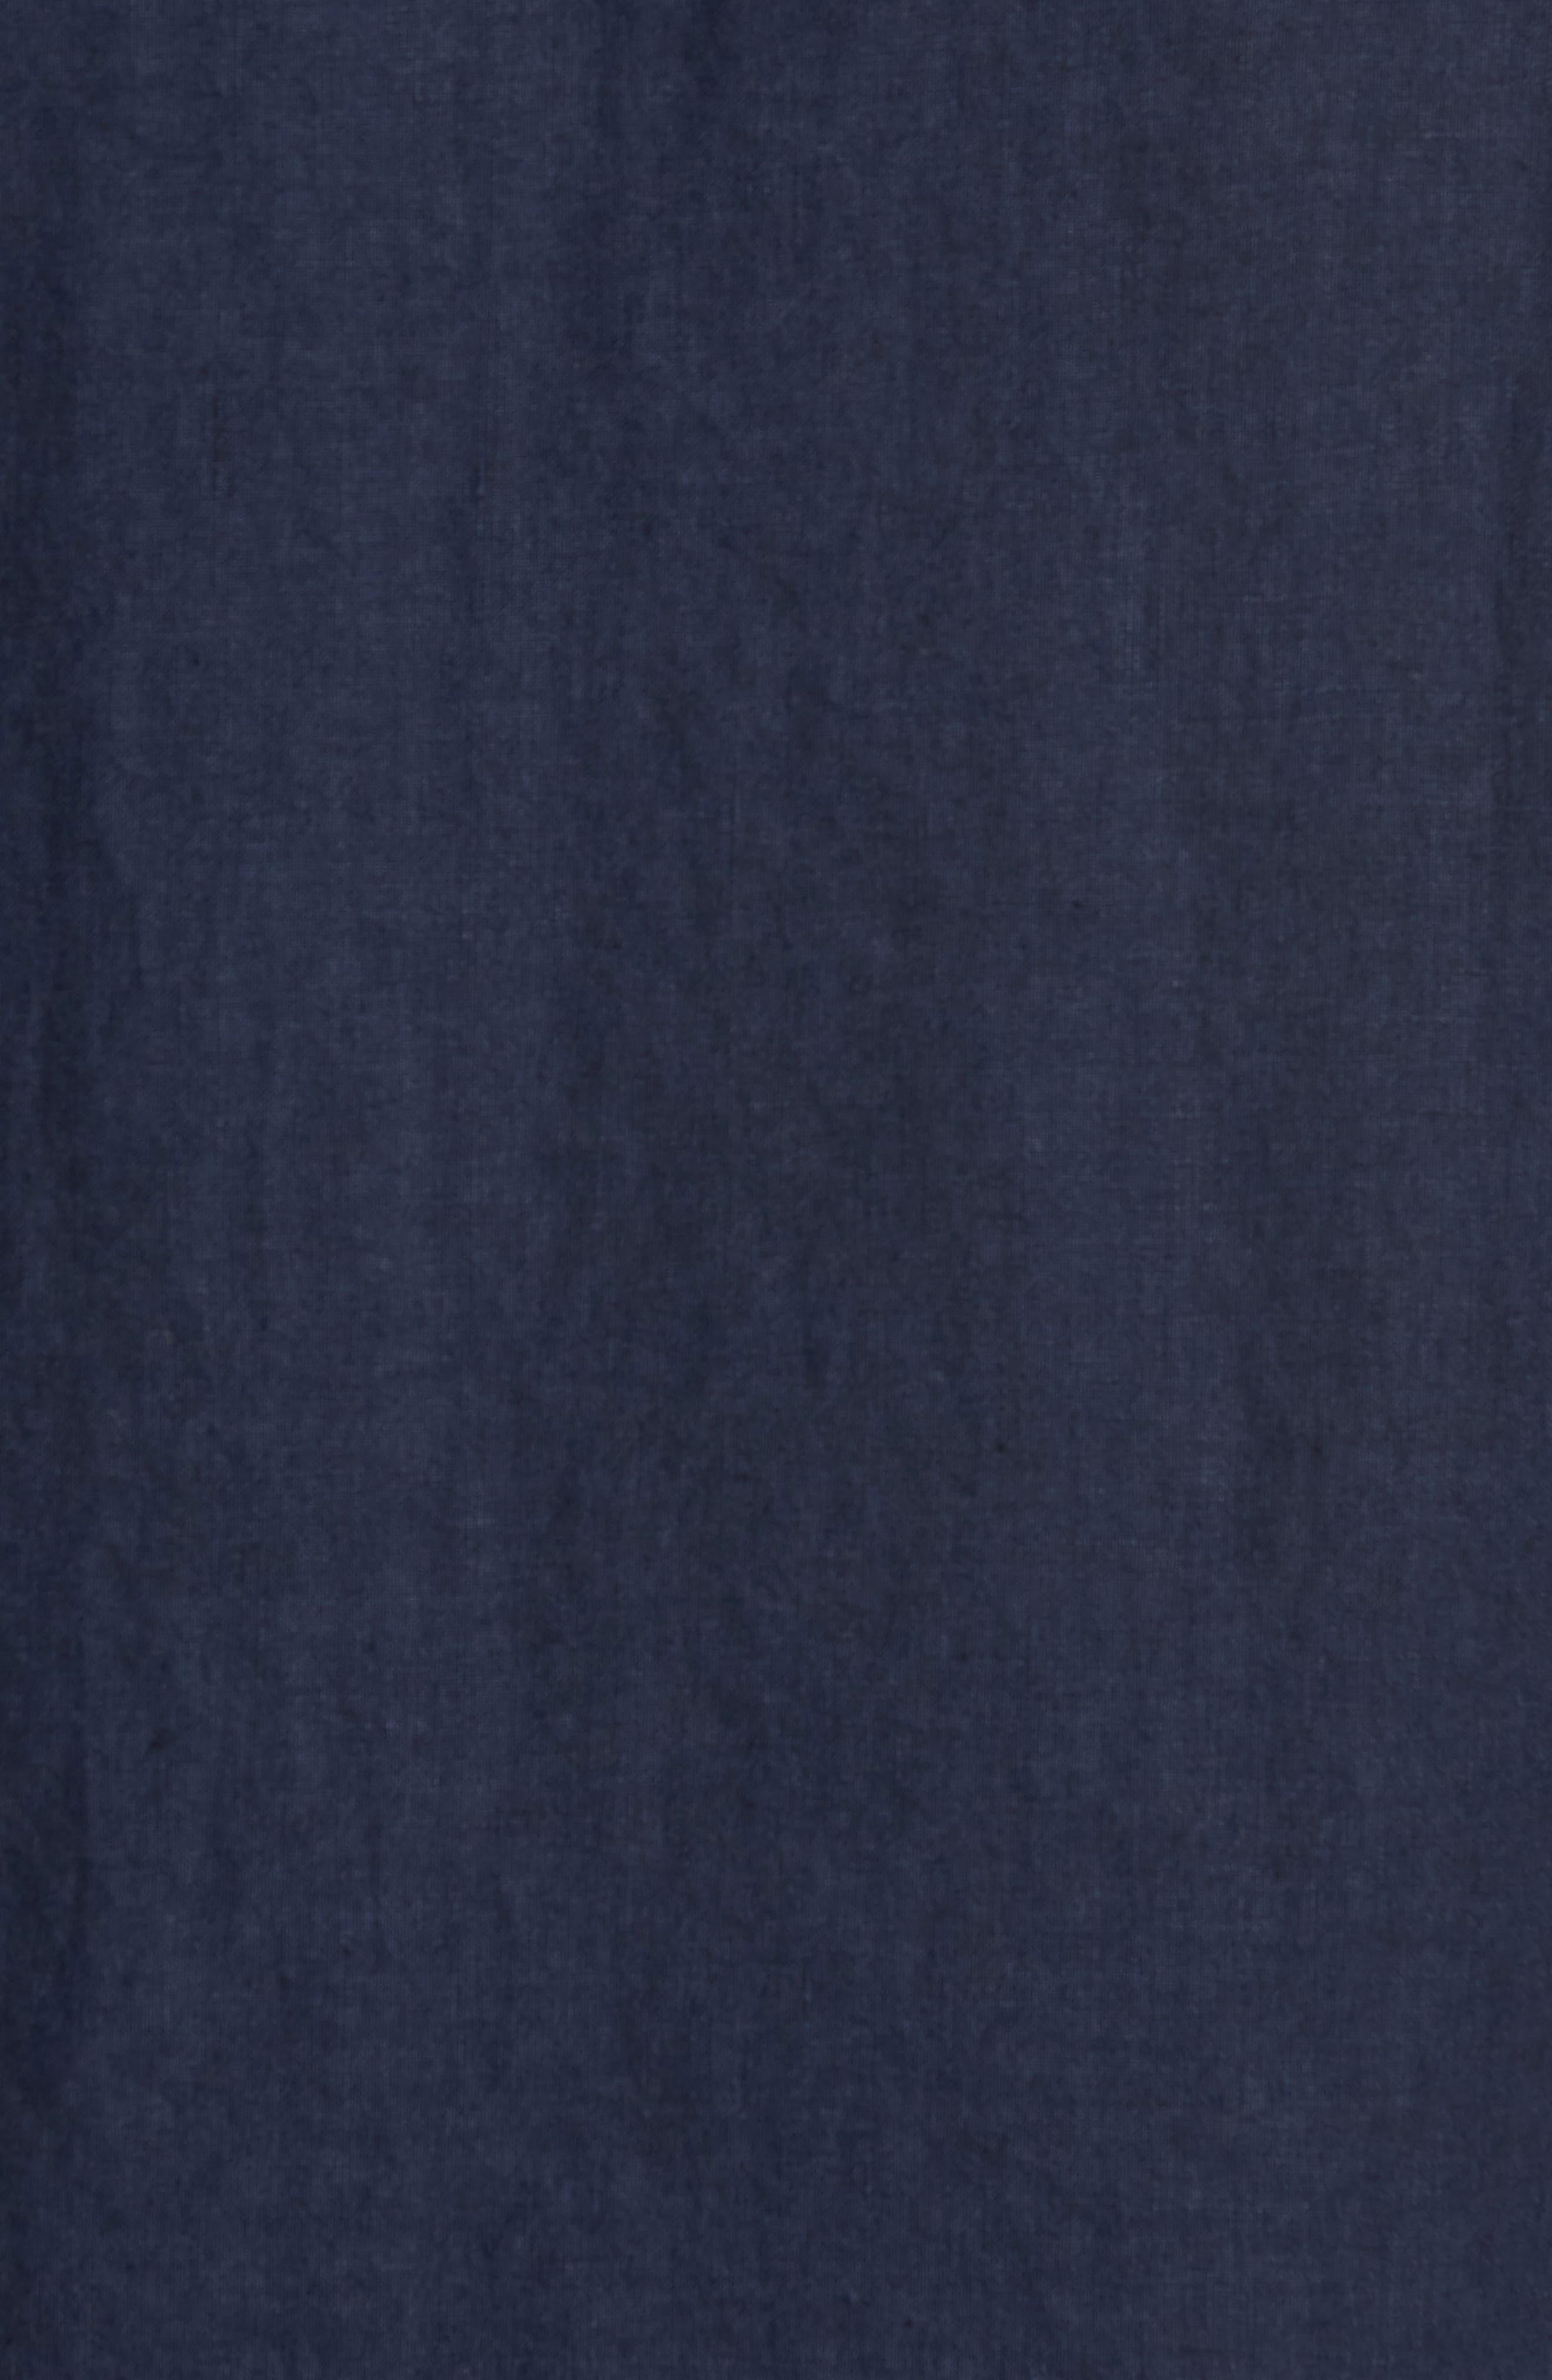 & Bros. Regular Fit Band Collar Linen Shirt,                             Alternate thumbnail 5, color,                             477